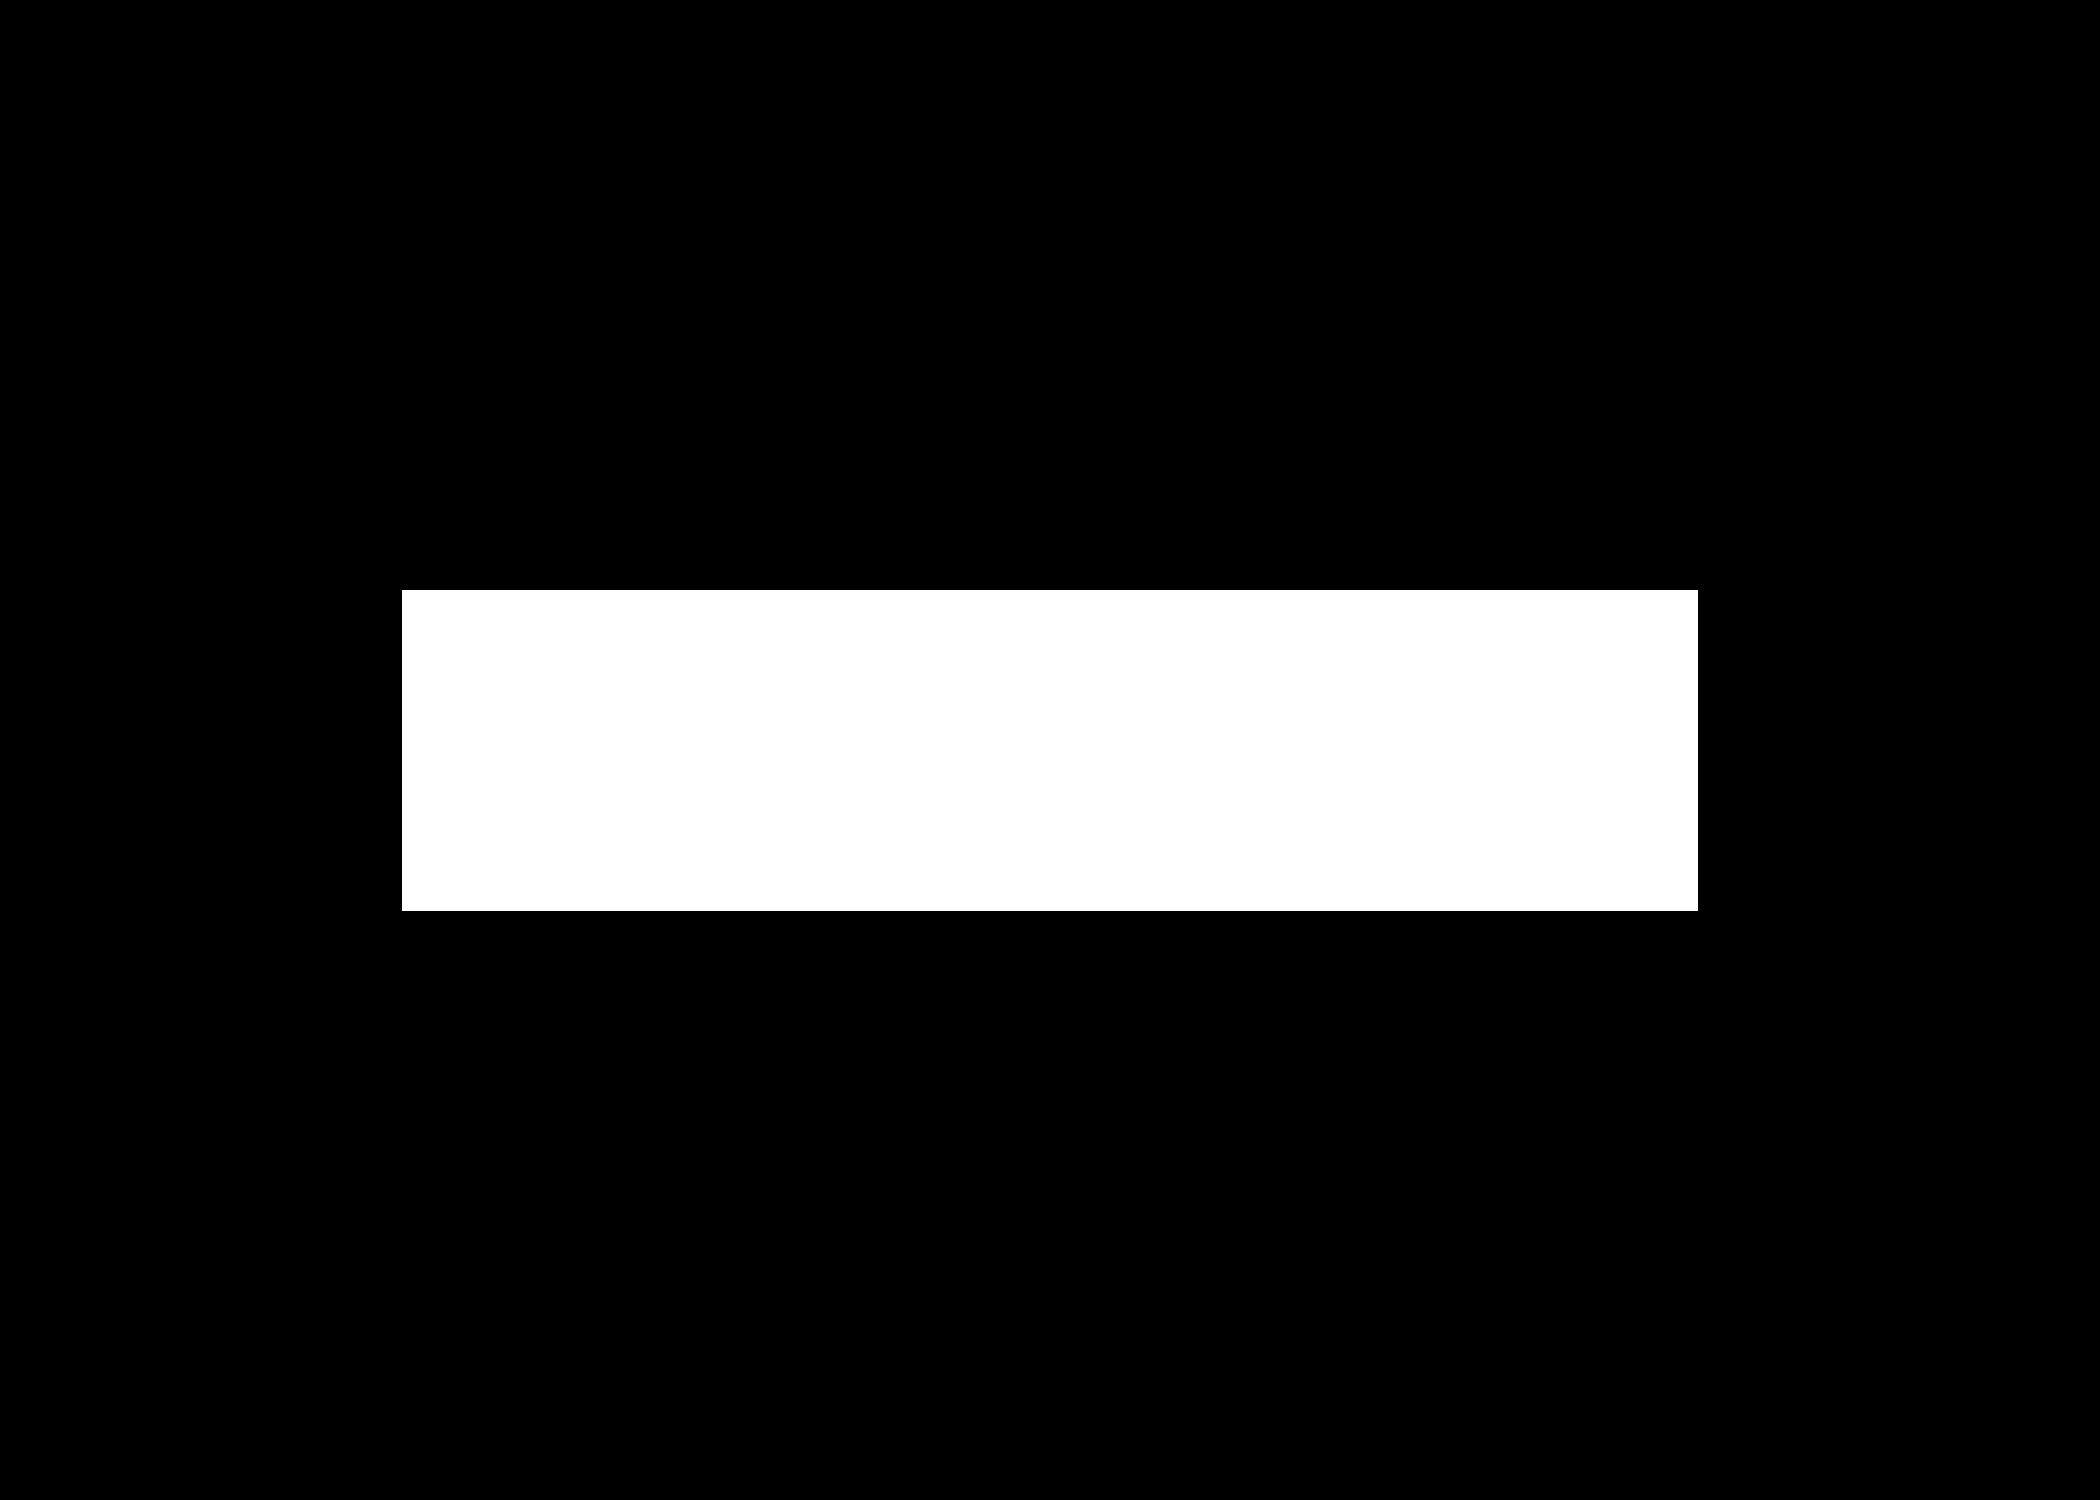 White Union Bank logo